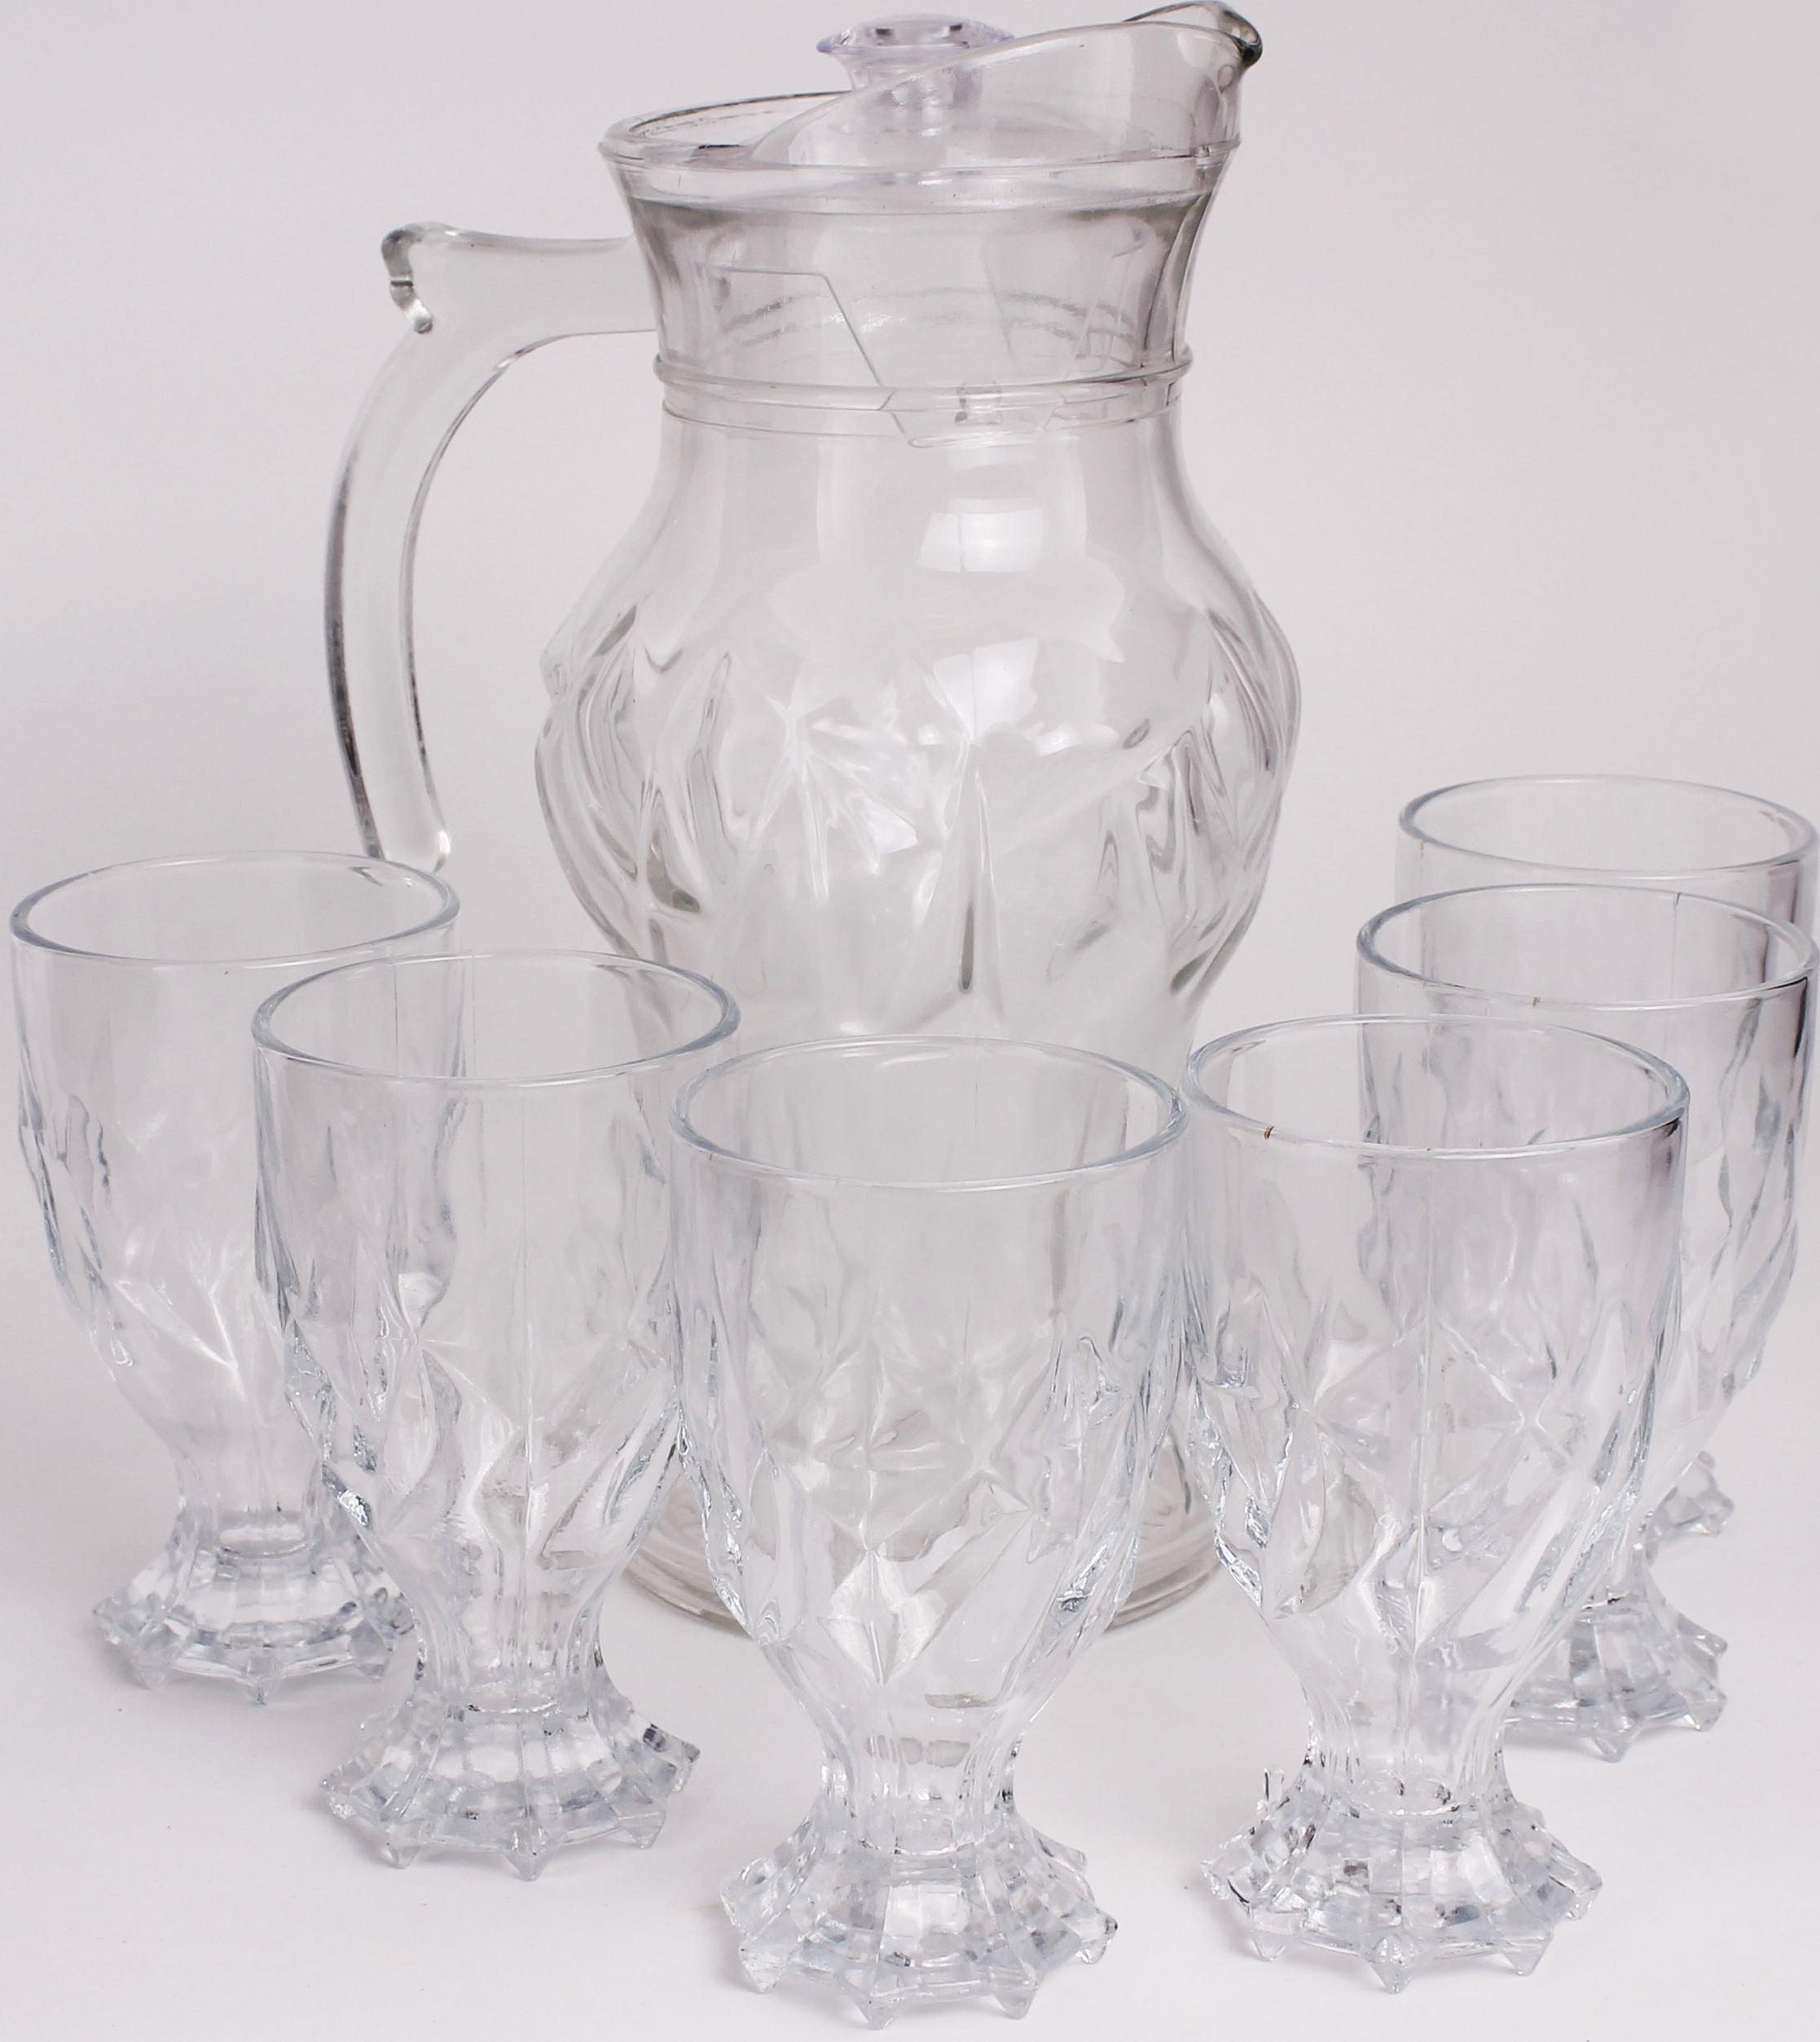 Набор Patricia: кувшин 1,8 л, 6 стаканов, 280 мл. IM99-5721IM99-5721